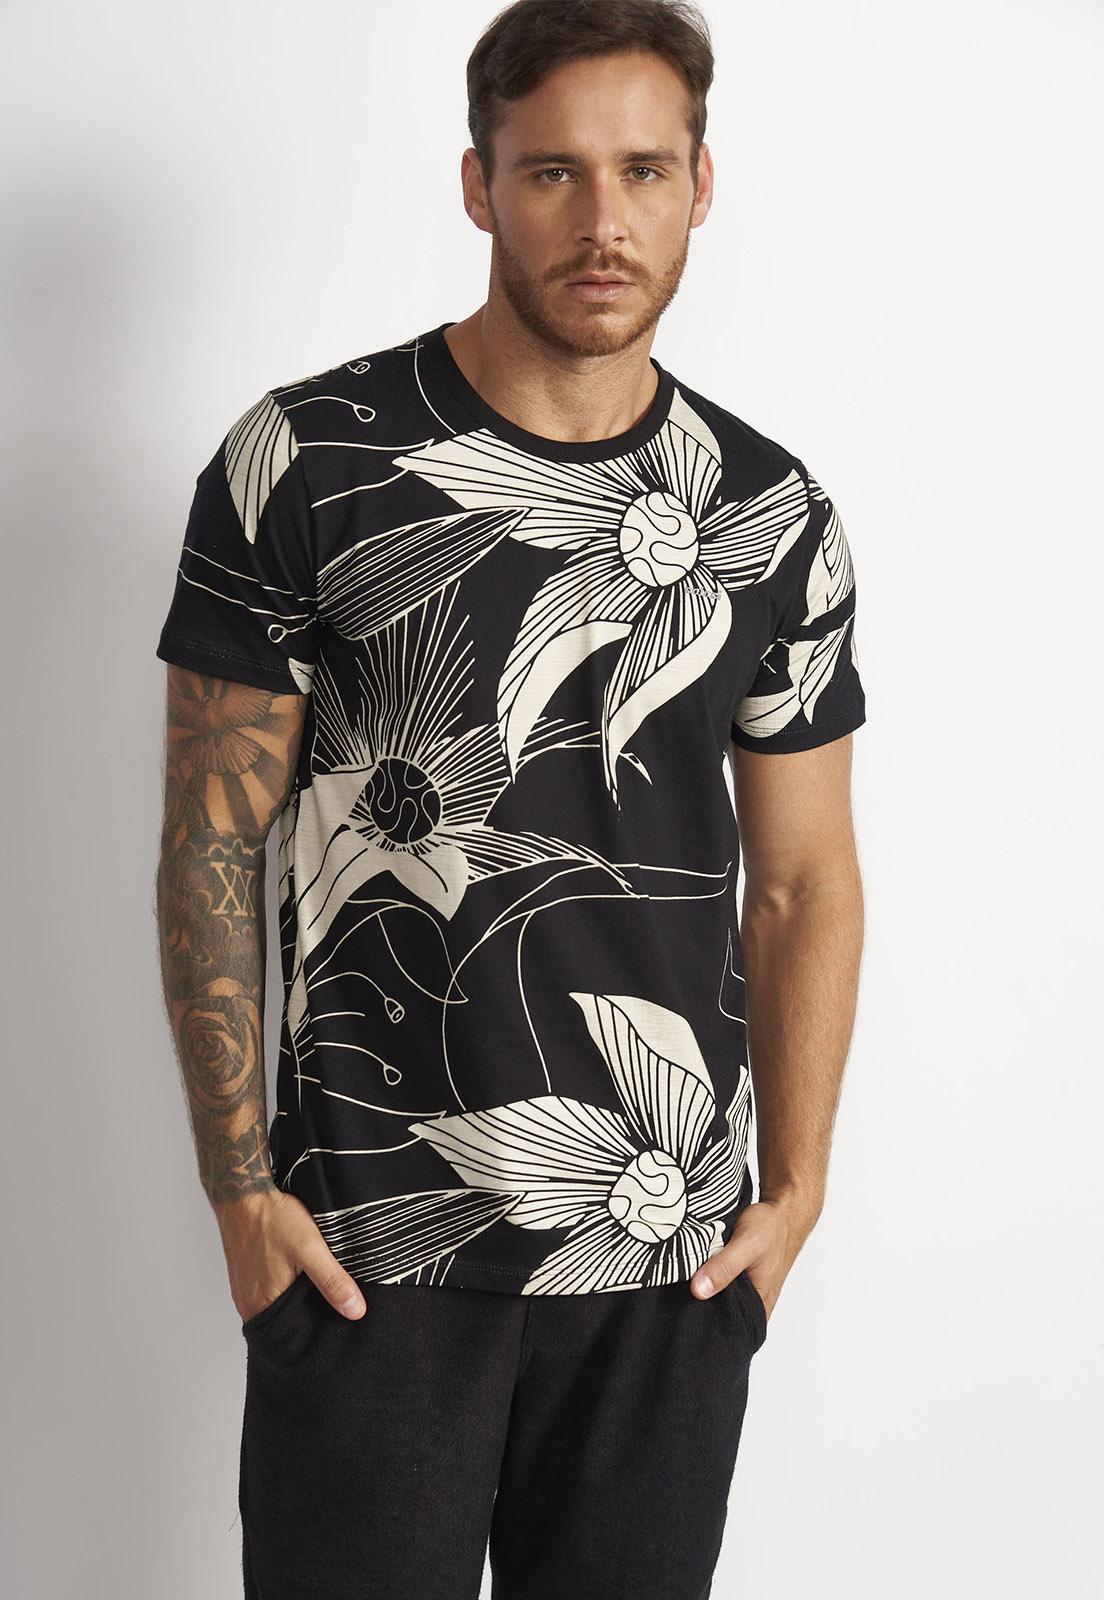 Camiseta Colcci Preto Estampado